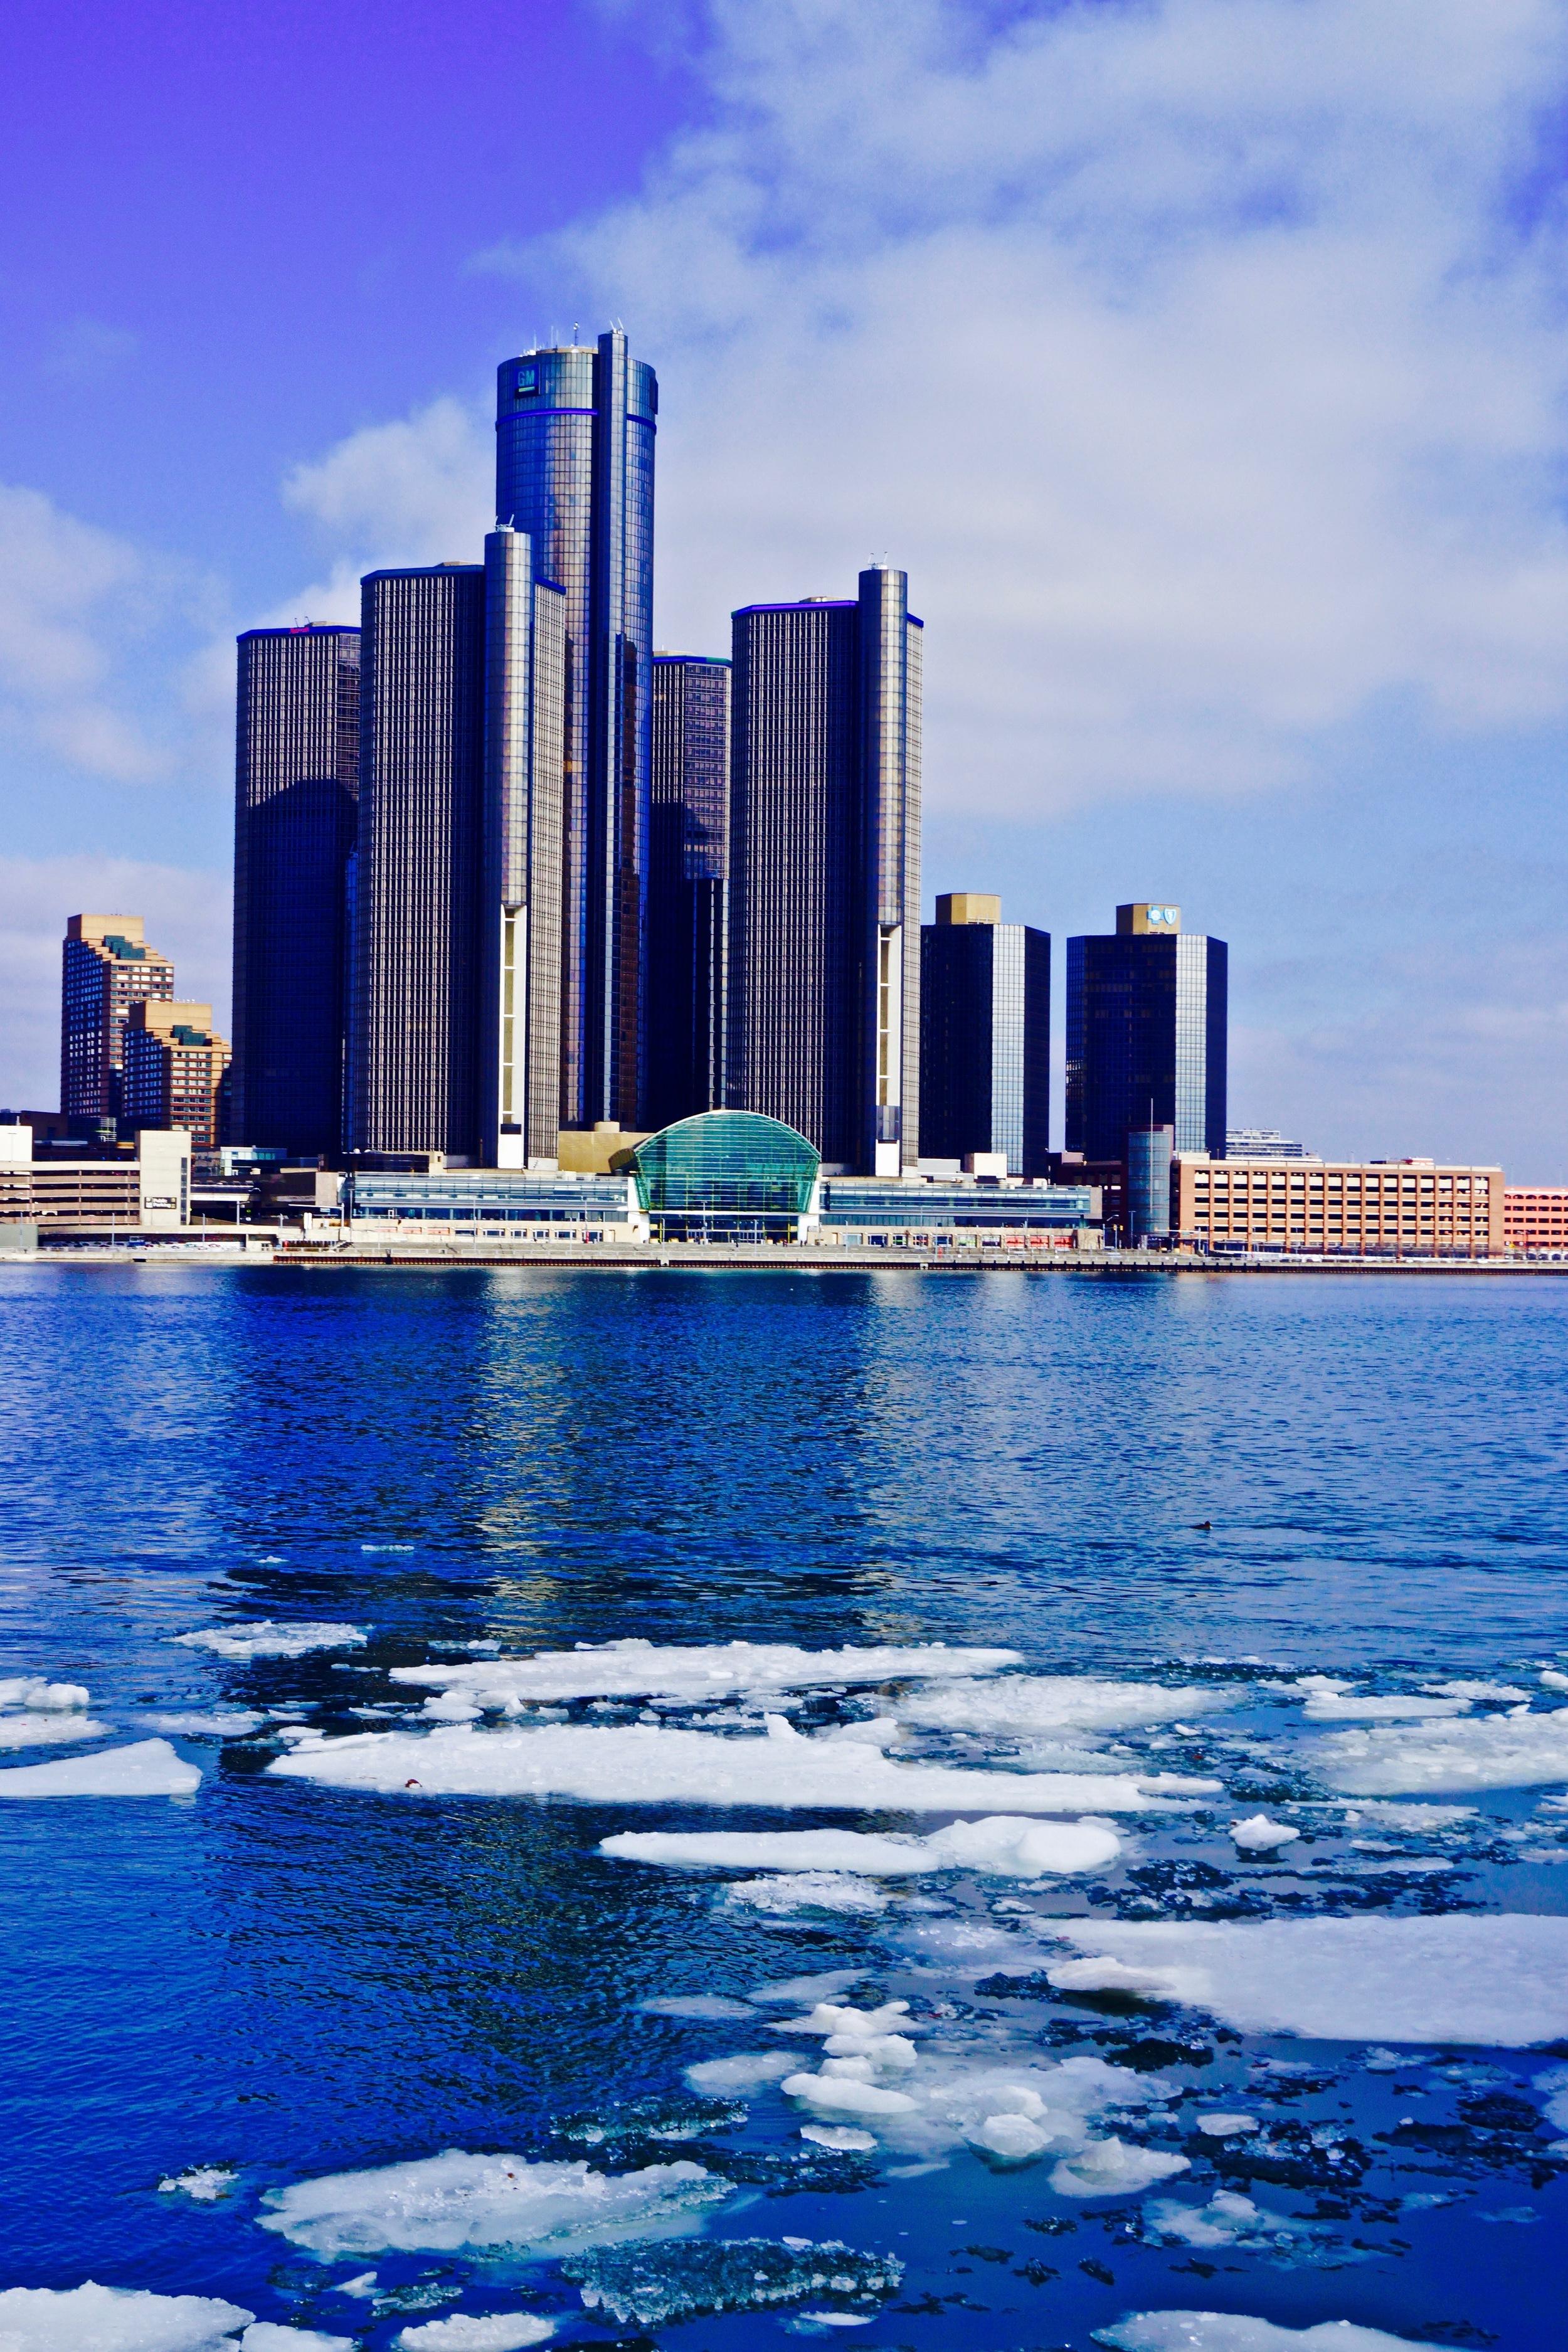 Detroit, Michigan, March 2015